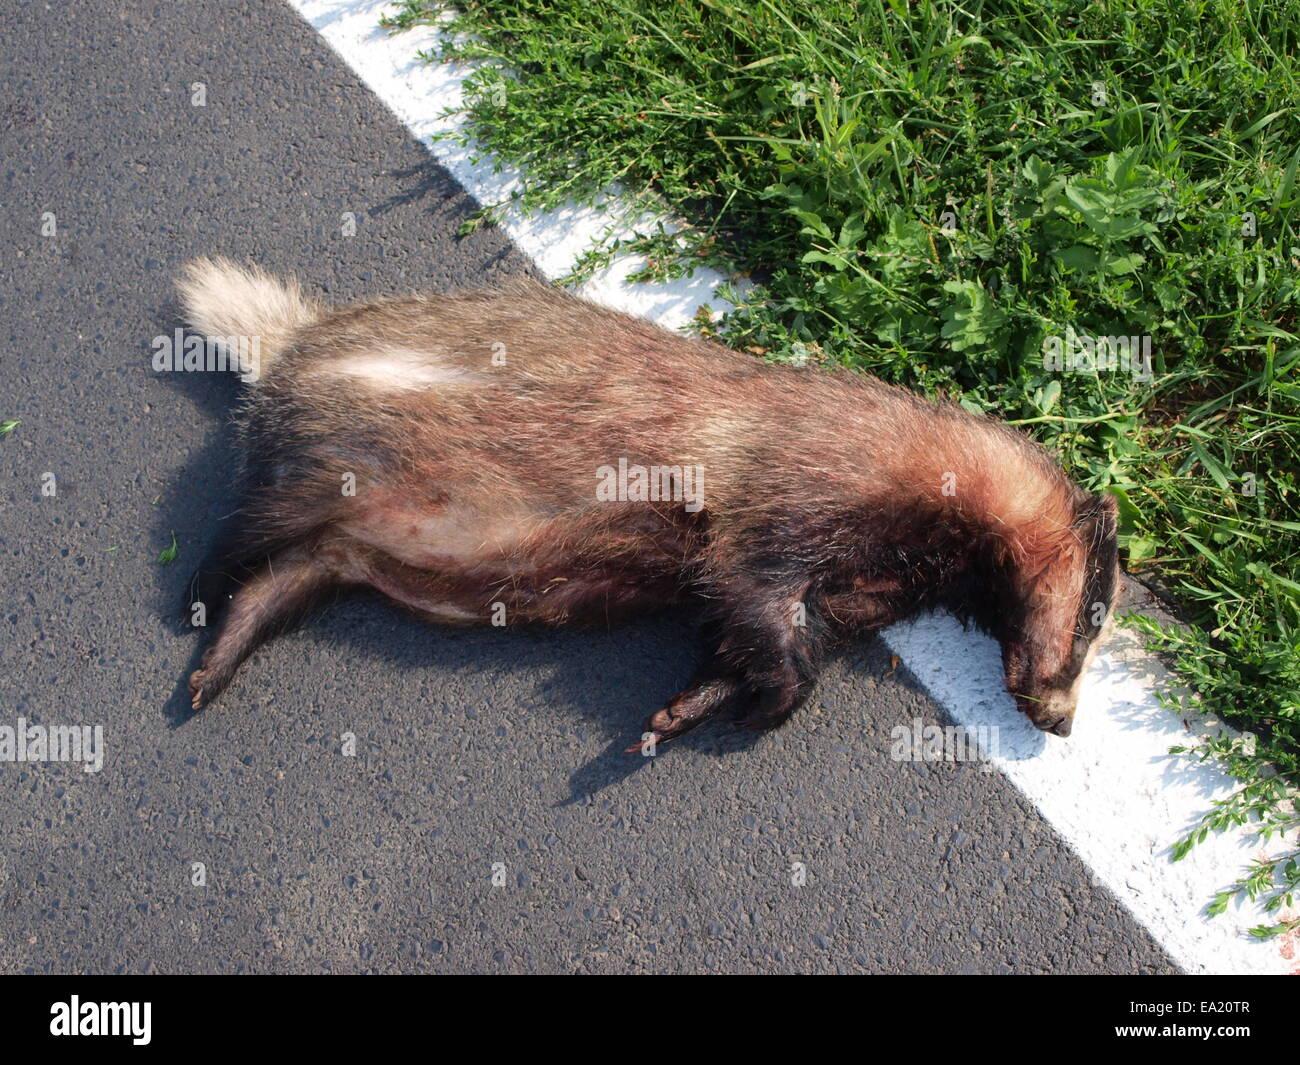 Badger como víctima de tráfico Imagen De Stock